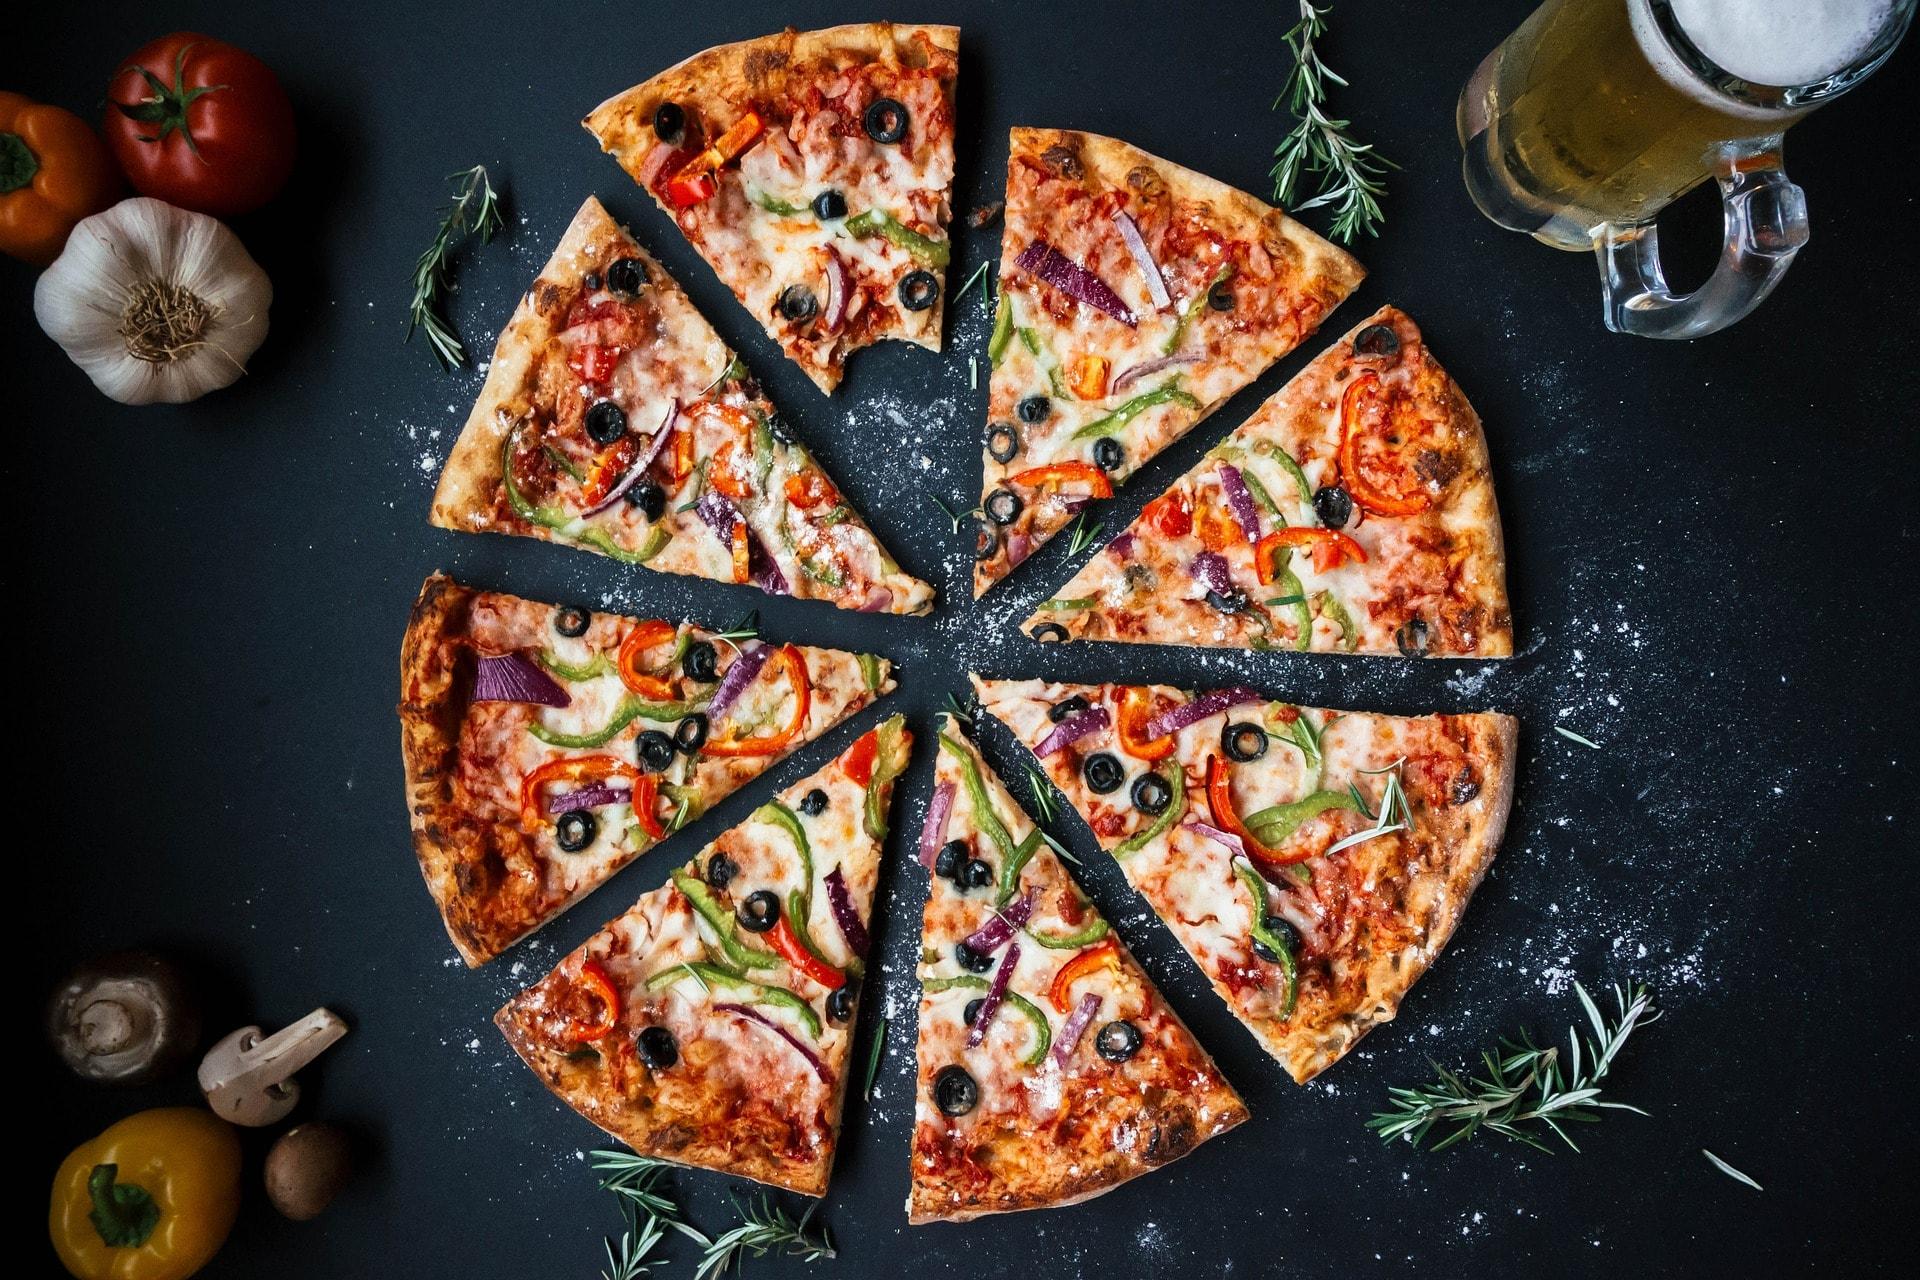 The Best Pizzerias In And Around Casco Viejo Panama Performance & event venue · pizza place. around casco viejo panama